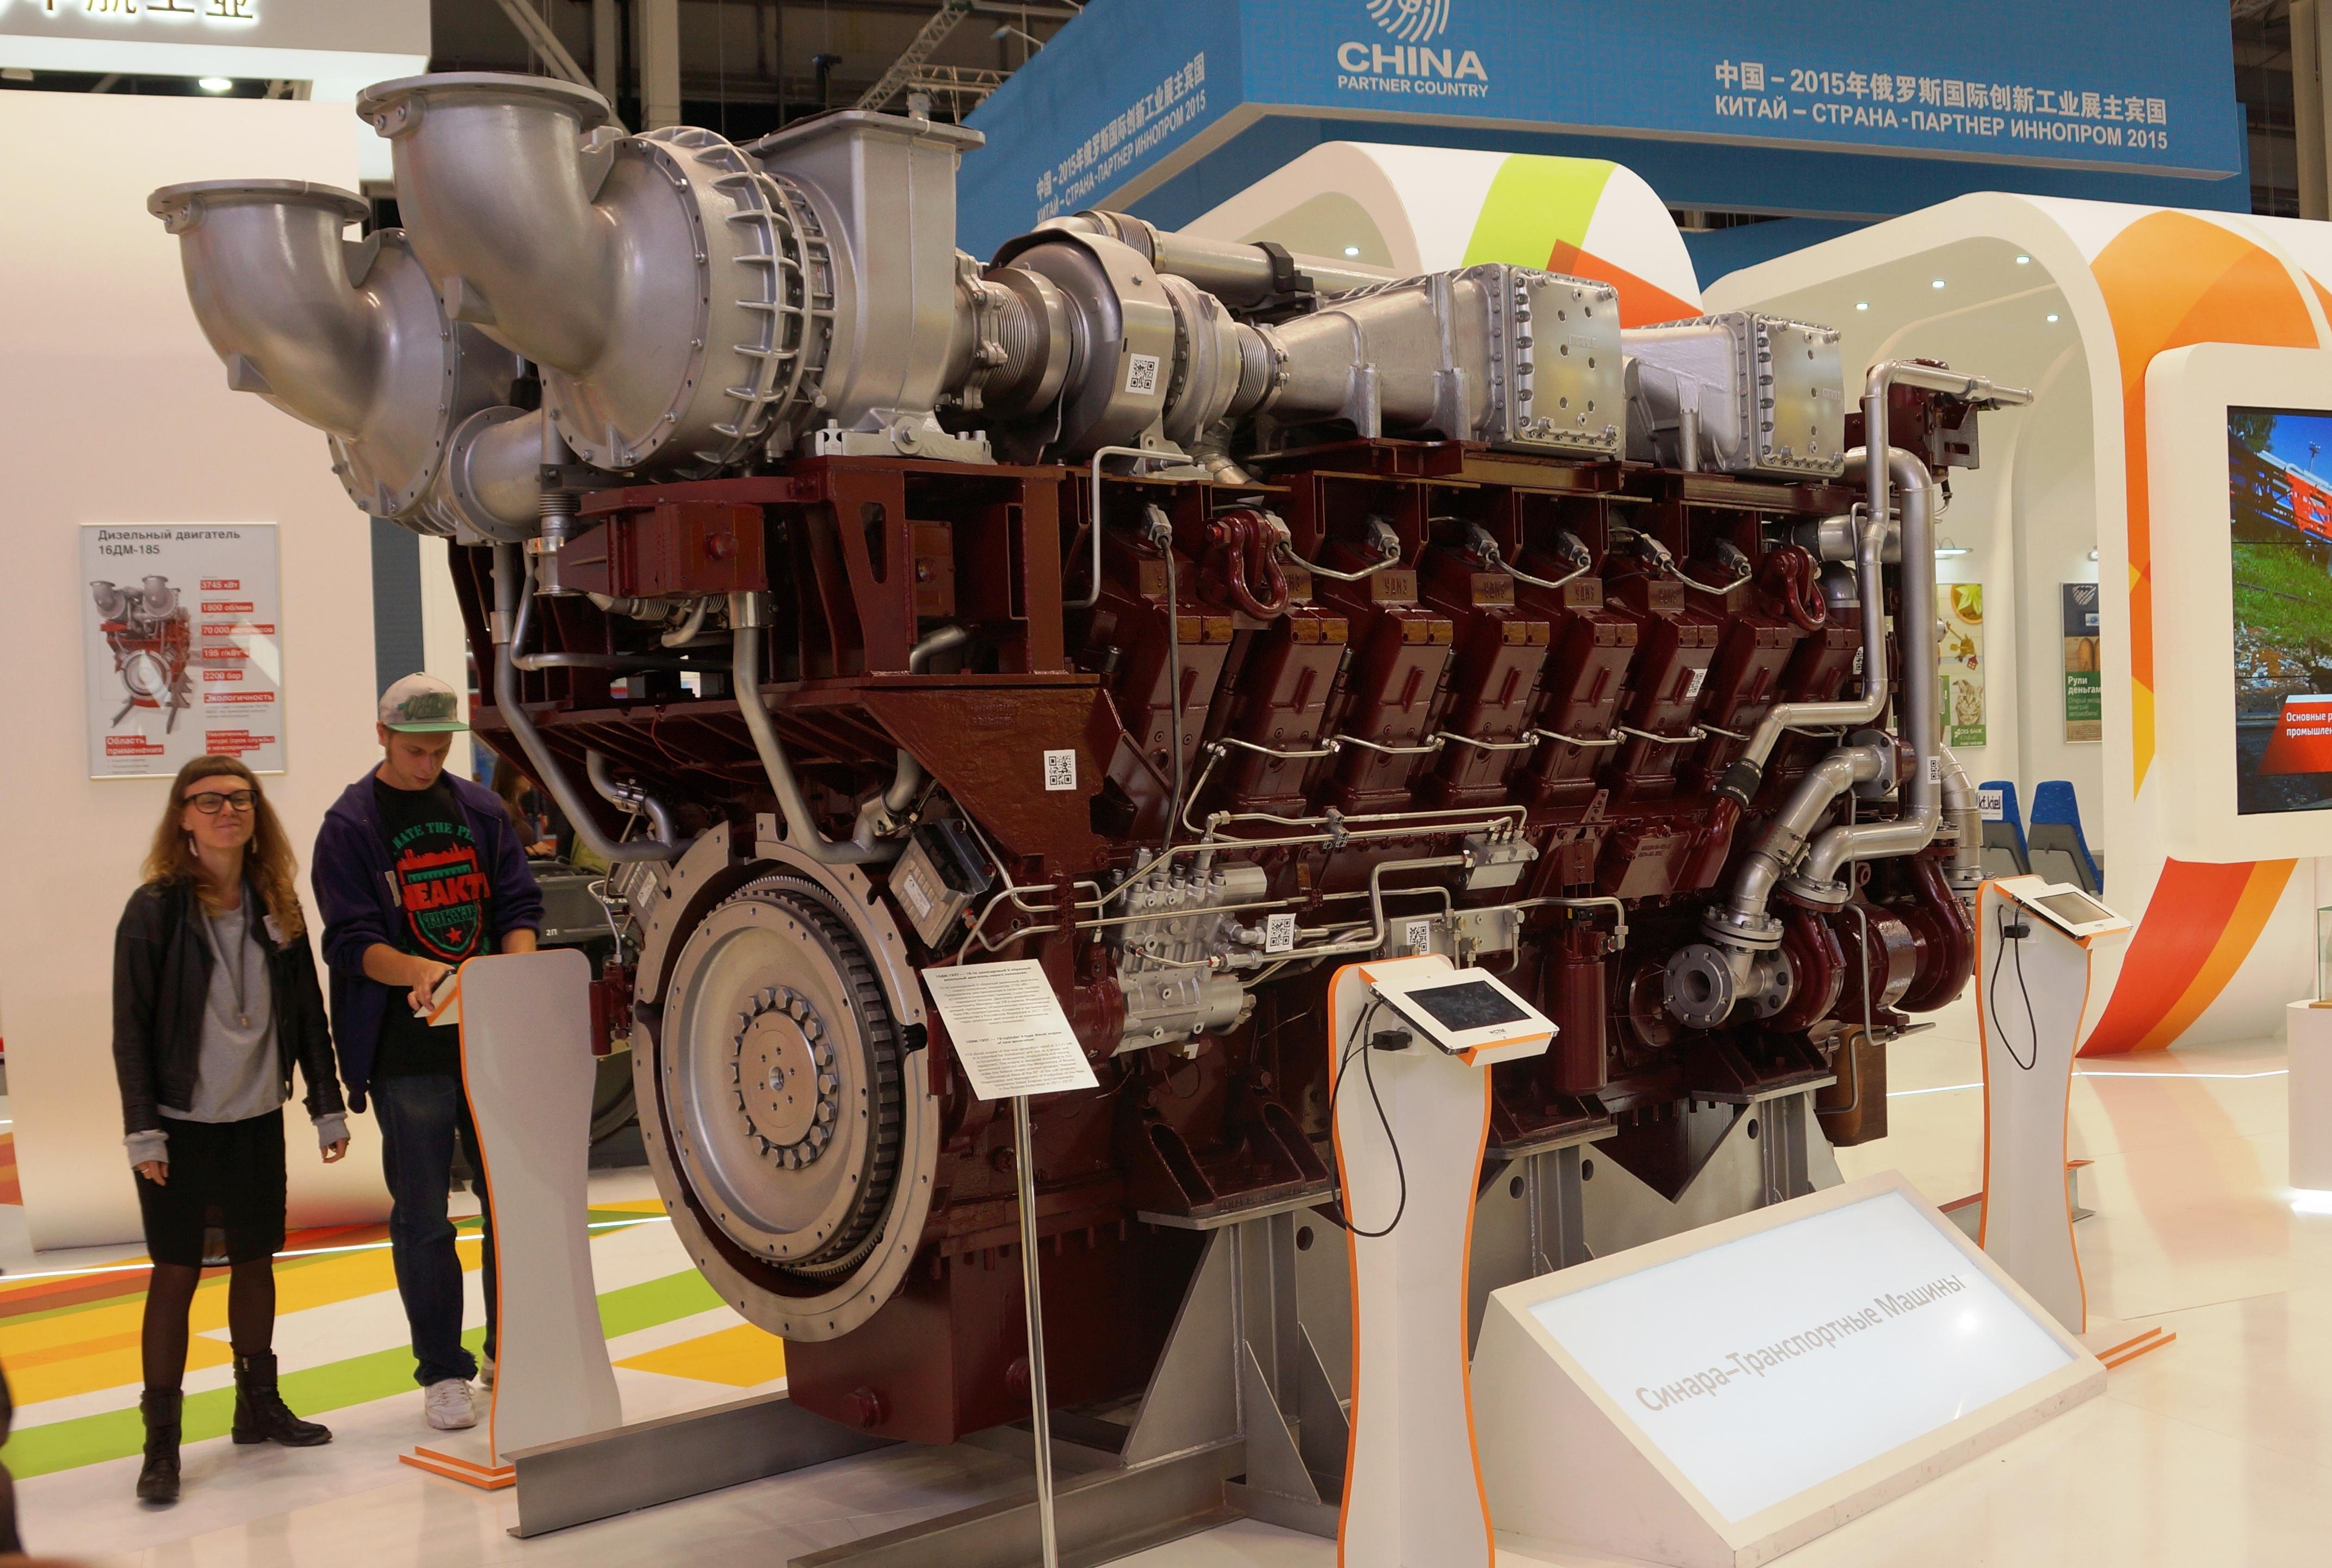 Od informatičke tehnologije do strojogradnje: 5 najzanimljivijih ruskih izuma s izložbe Innoprom-2015.